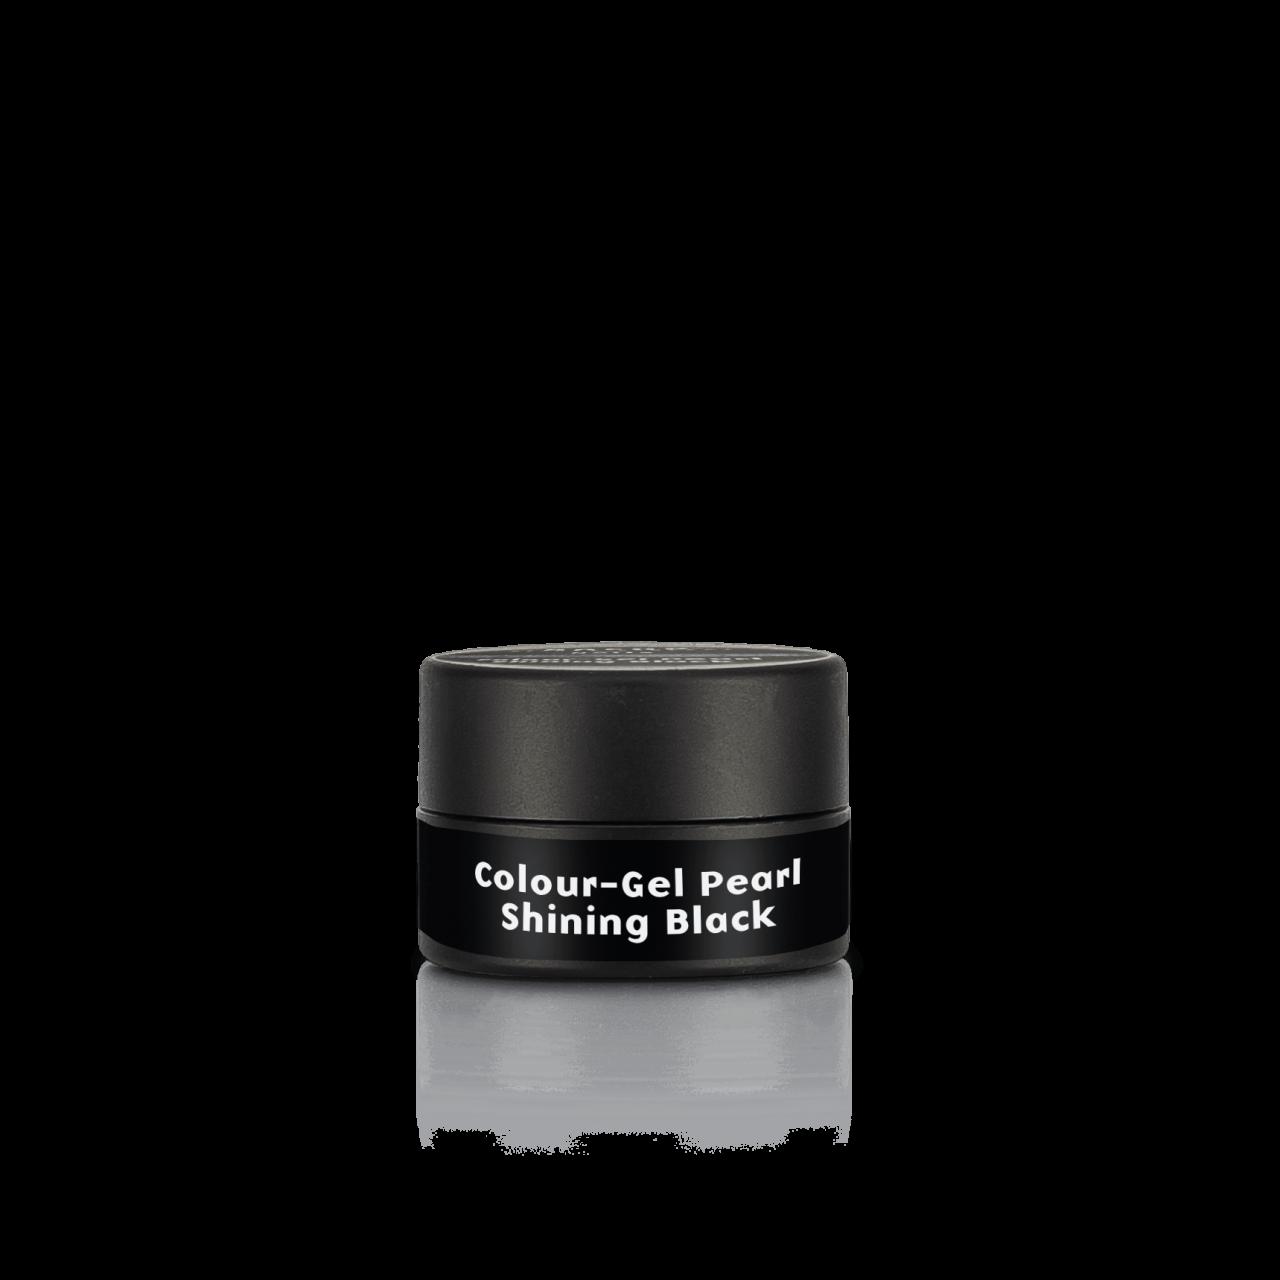 Colour-Gel Pearl Shining Black 5 ml